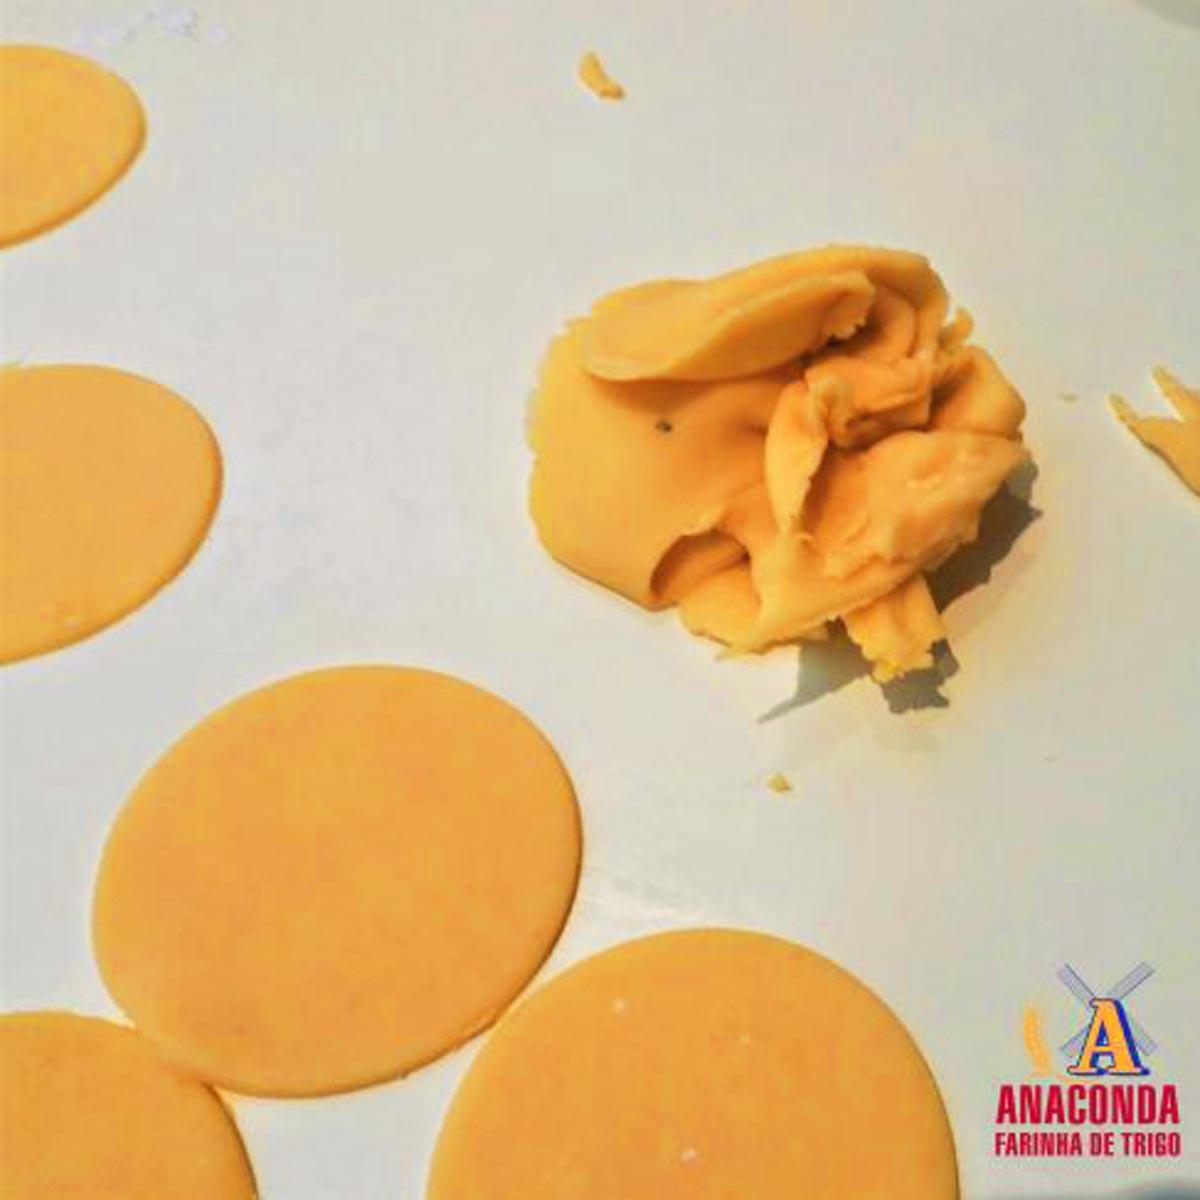 Farinha de Trigo Anaconda Premium Tipo 1 1kg c/10